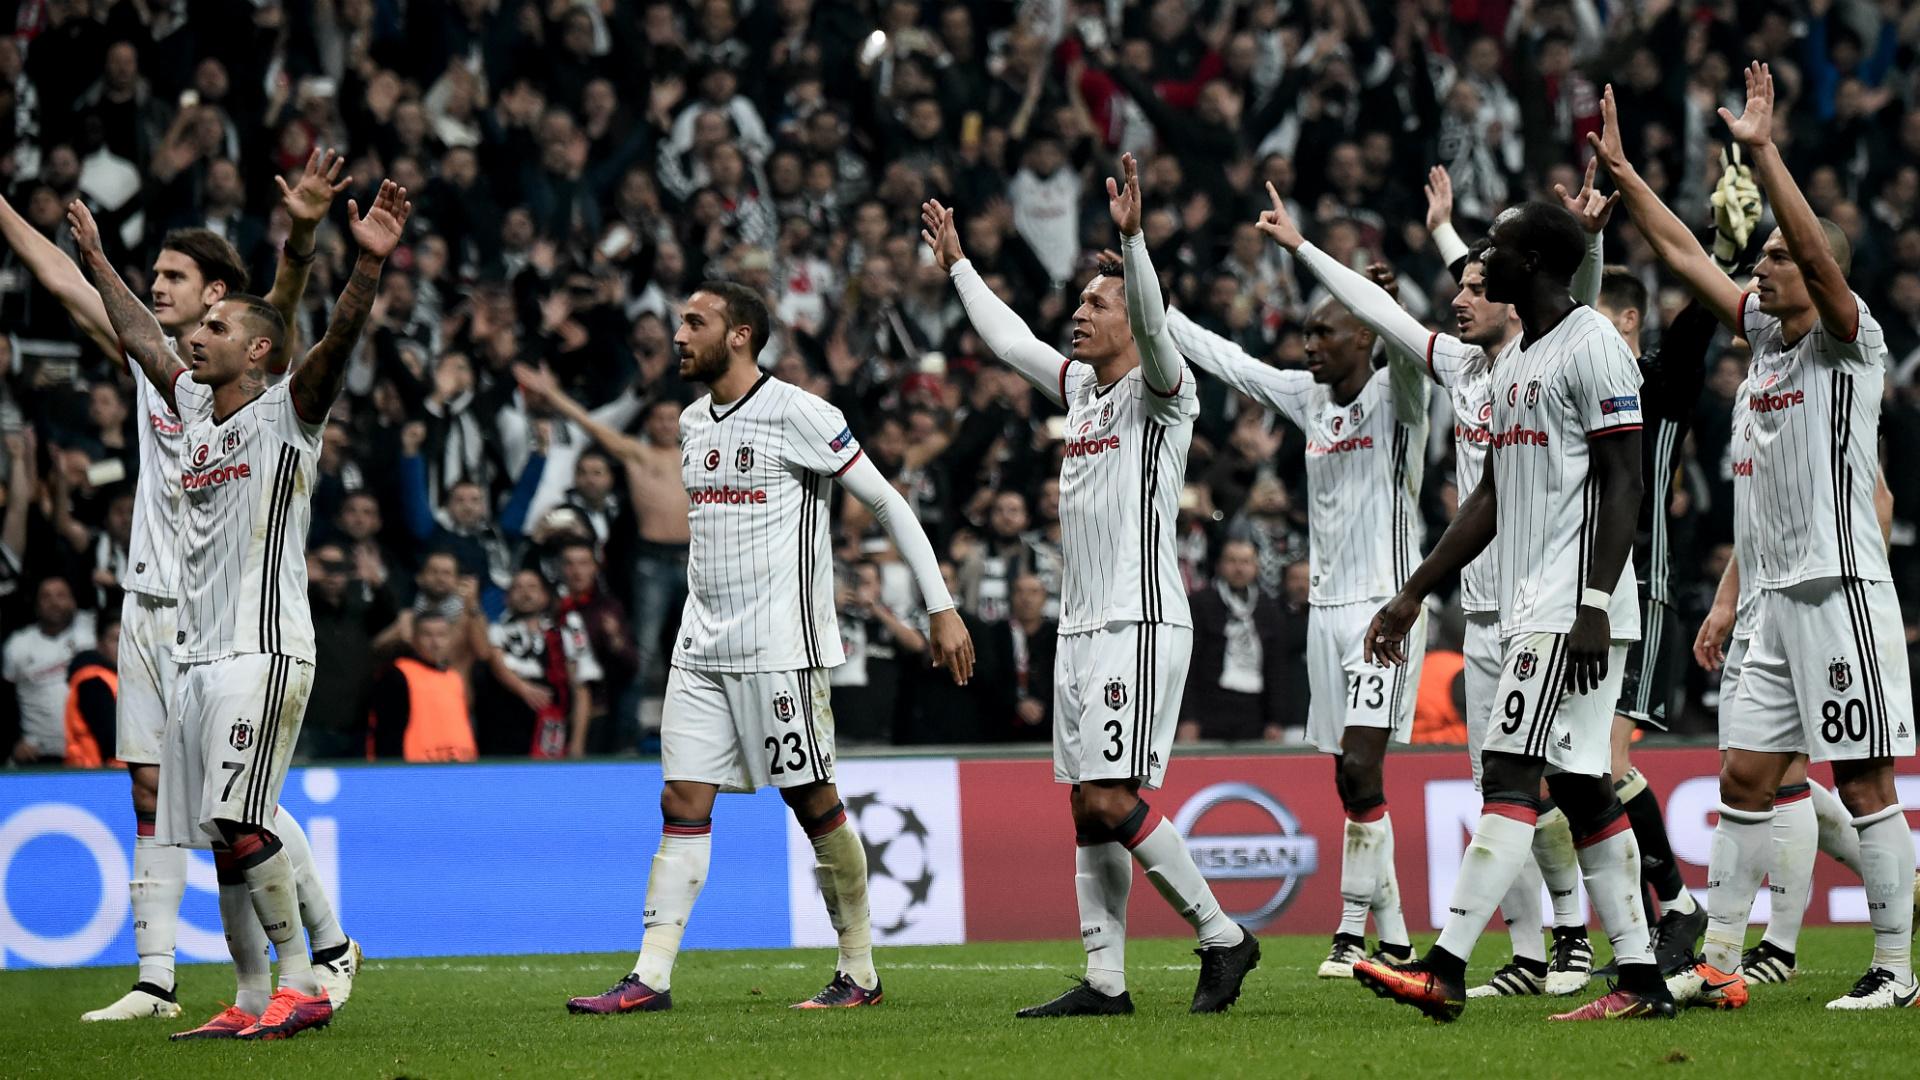 Nine-man Besiktas hopes end with 6-0 loss at Dynamo Kiev